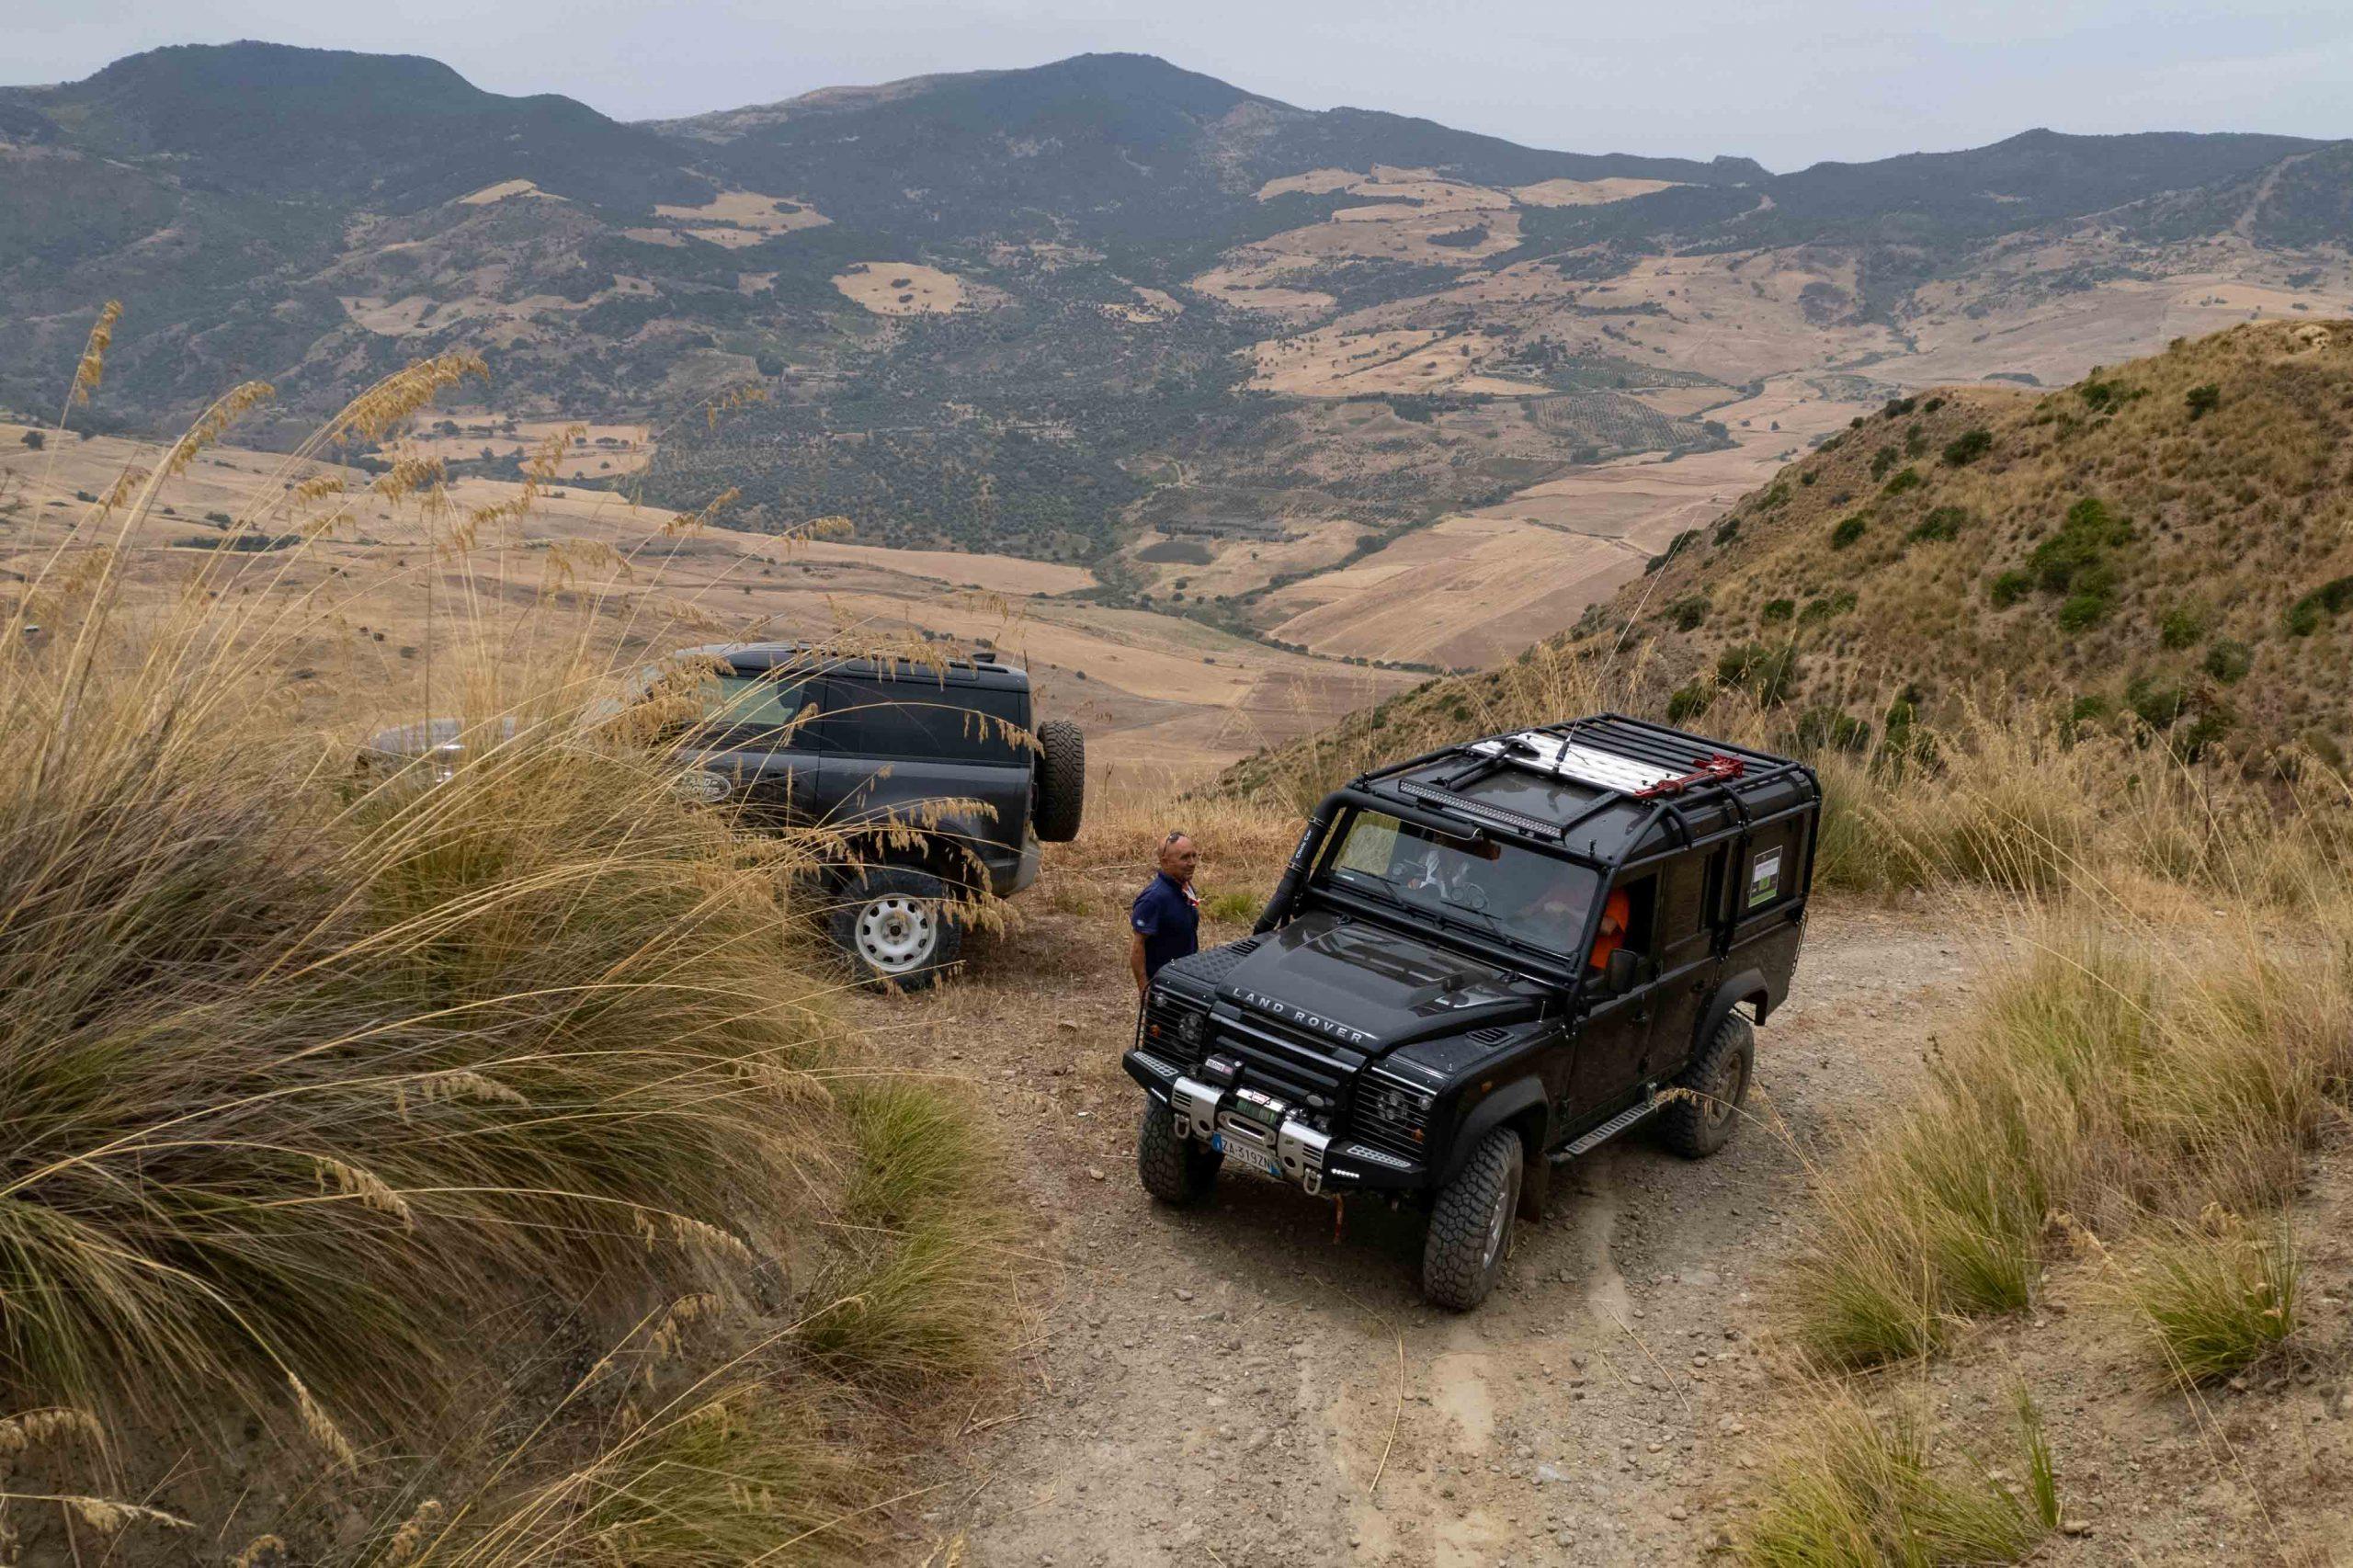 Land_Rover_Tour_Sicilia_2021_Land_Rover_Experience_Italia_-49